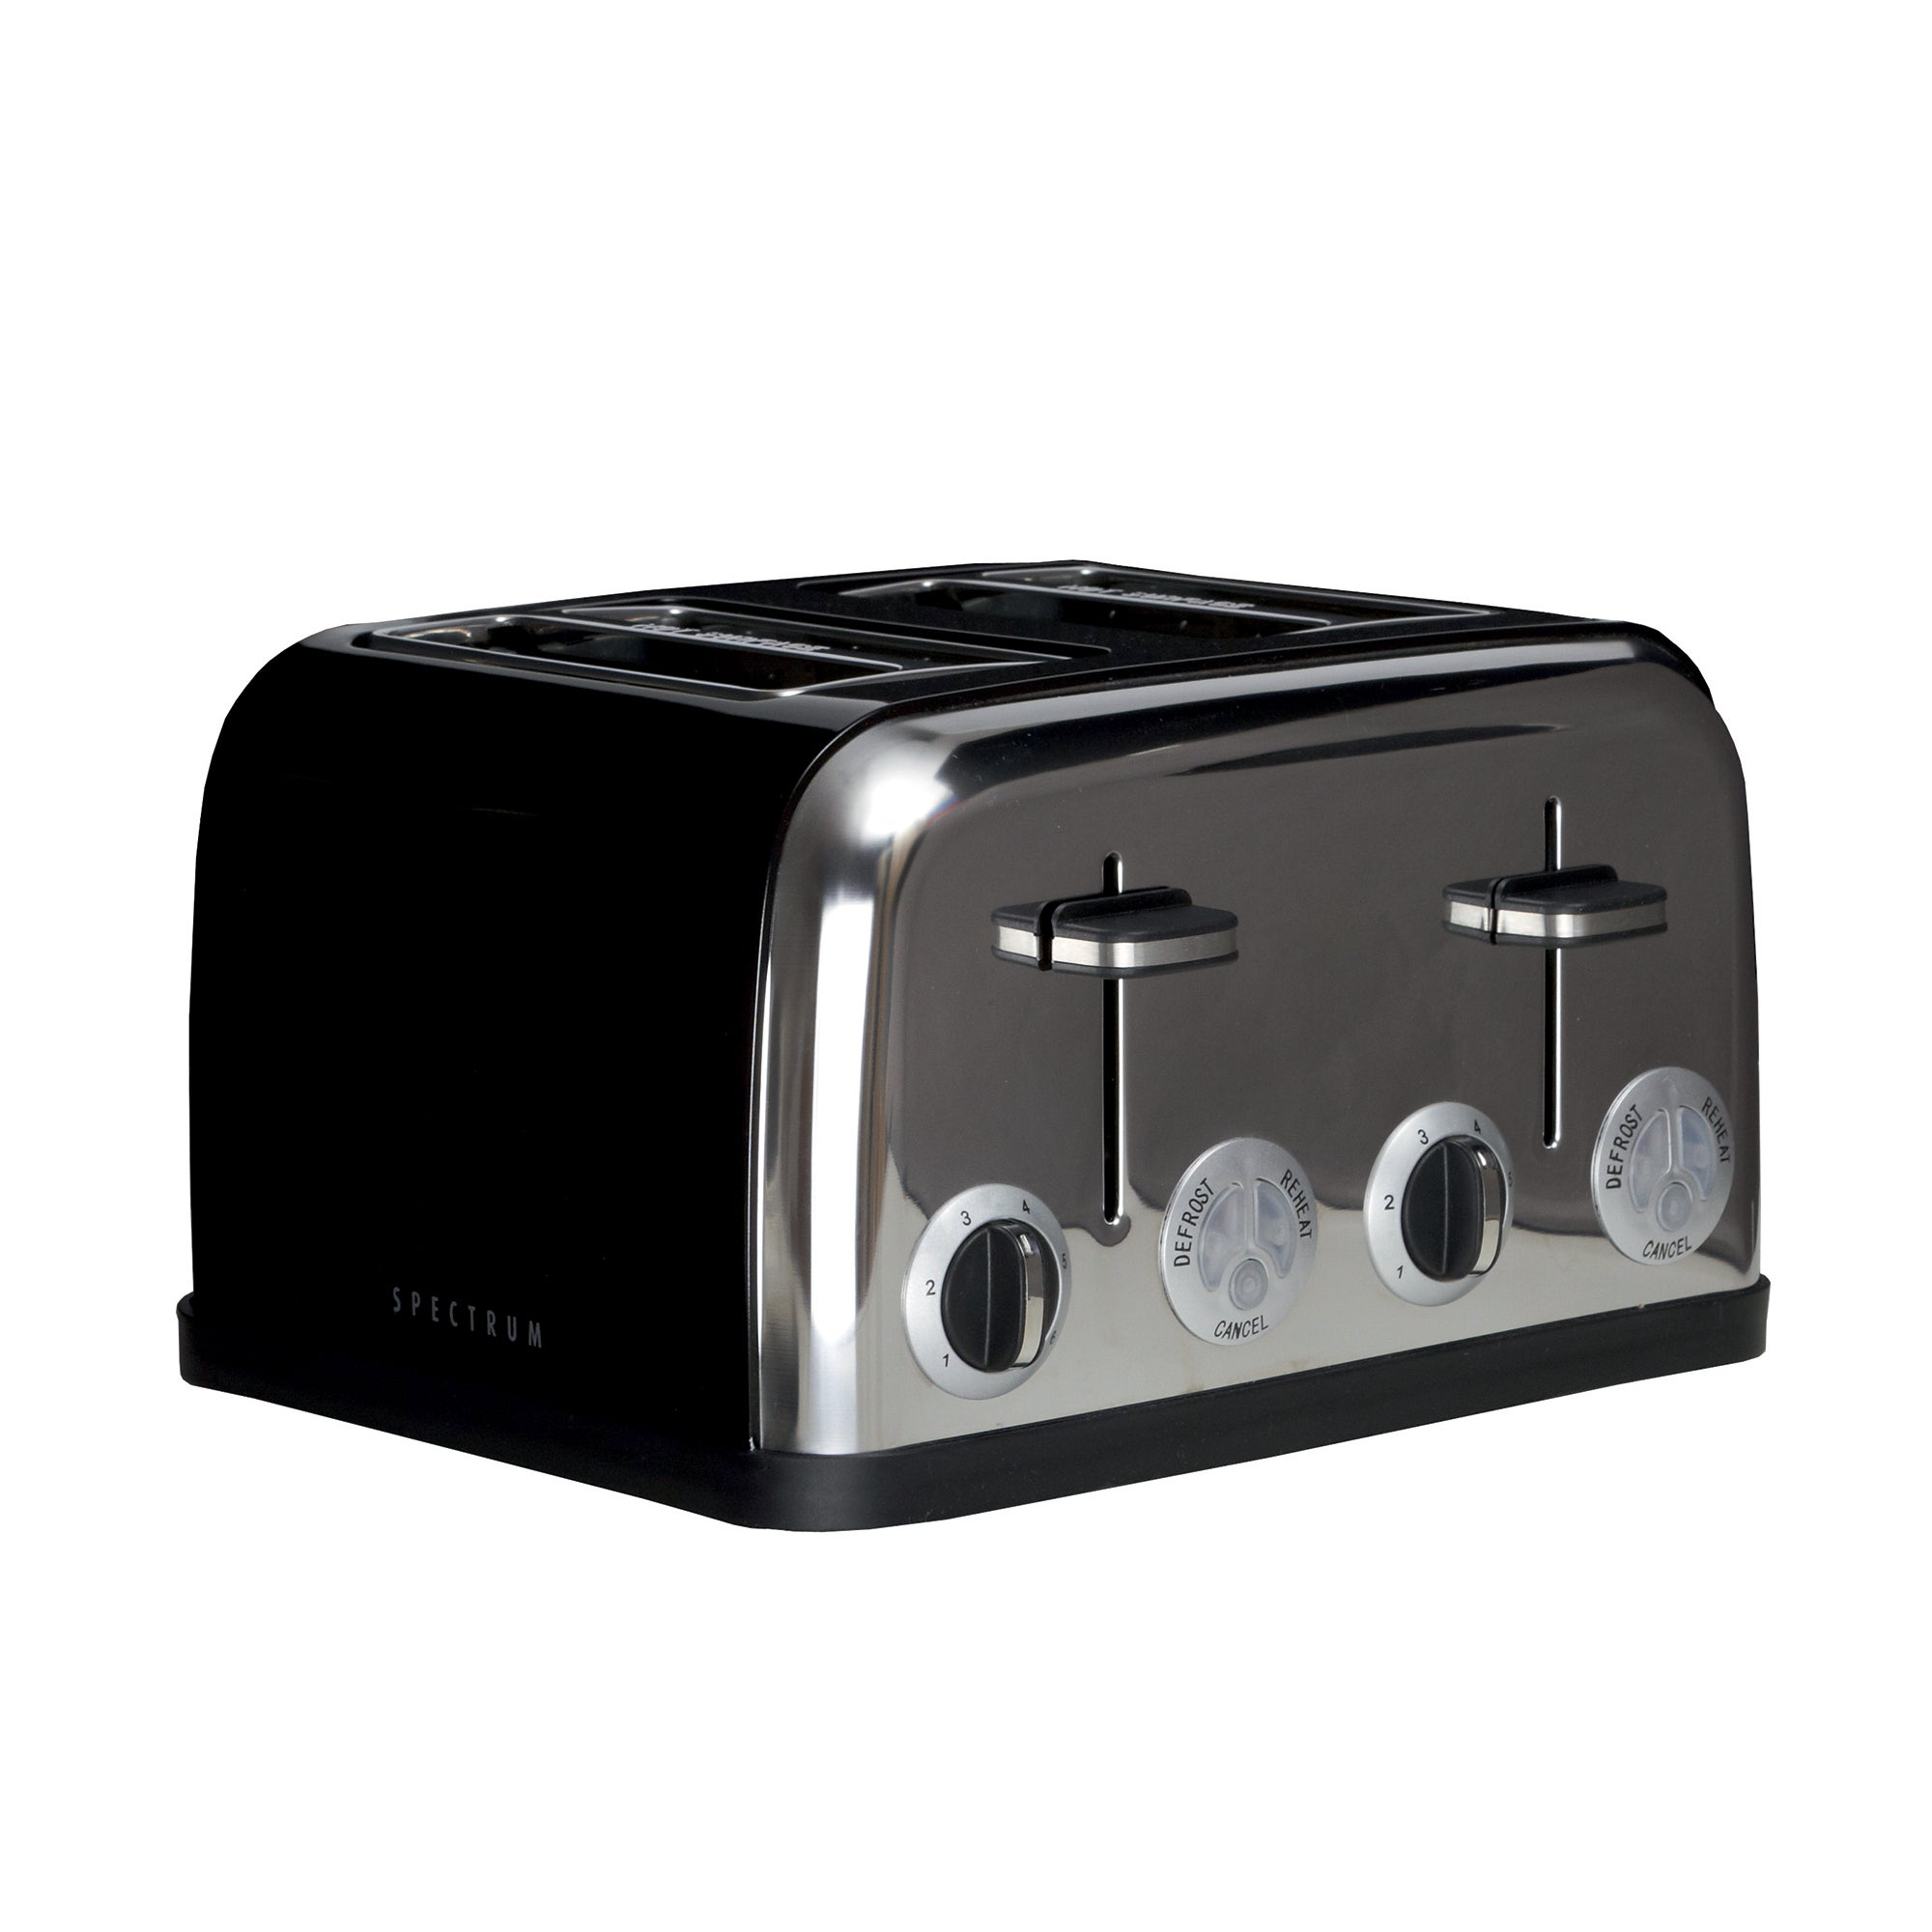 Spectrum Black 4 Slice Toaster Black